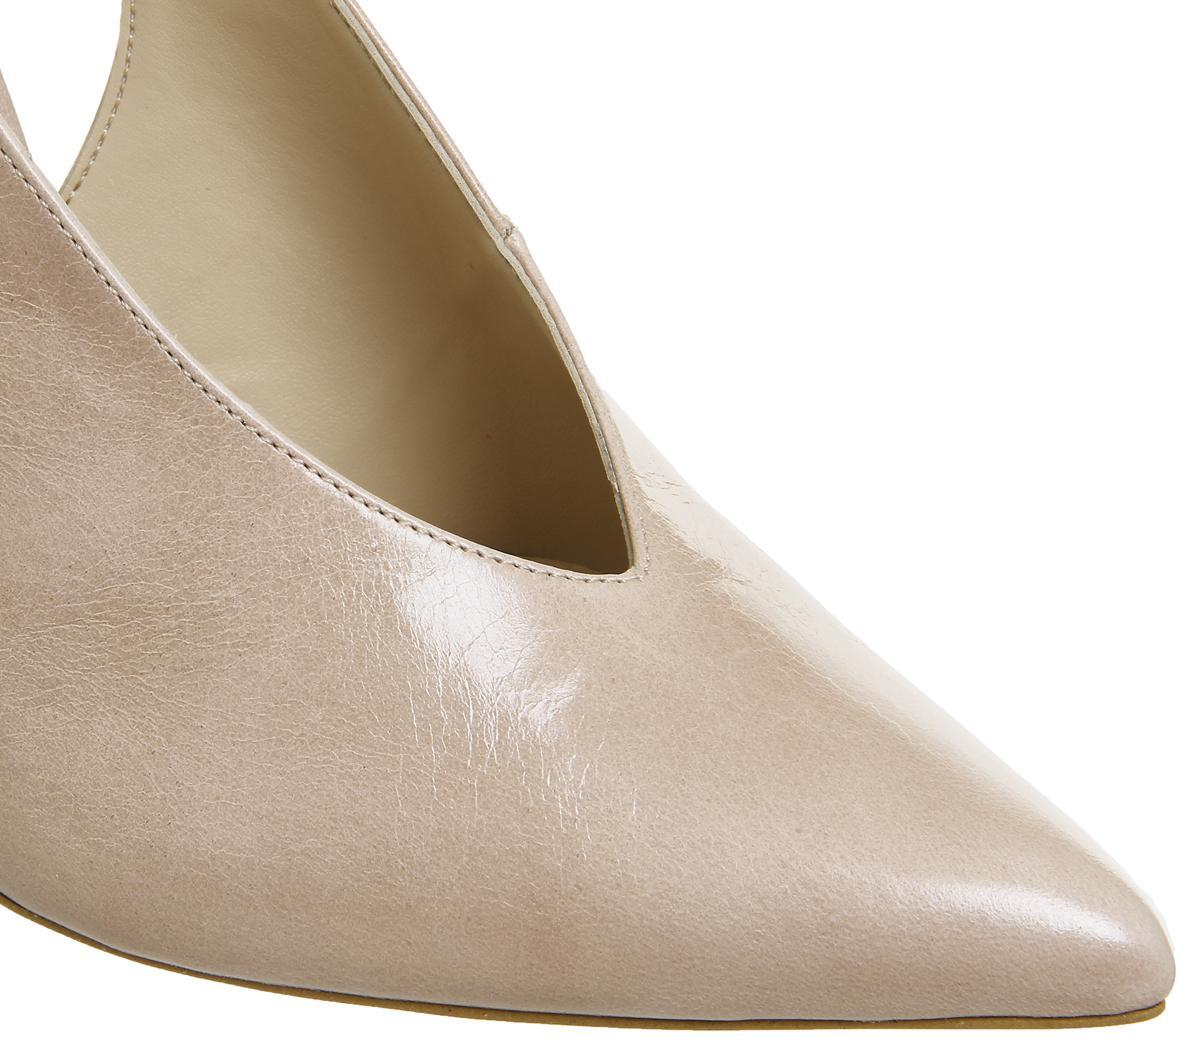 Womens Office Hix V Cut Slingback Court Heels Nude Leather Heels